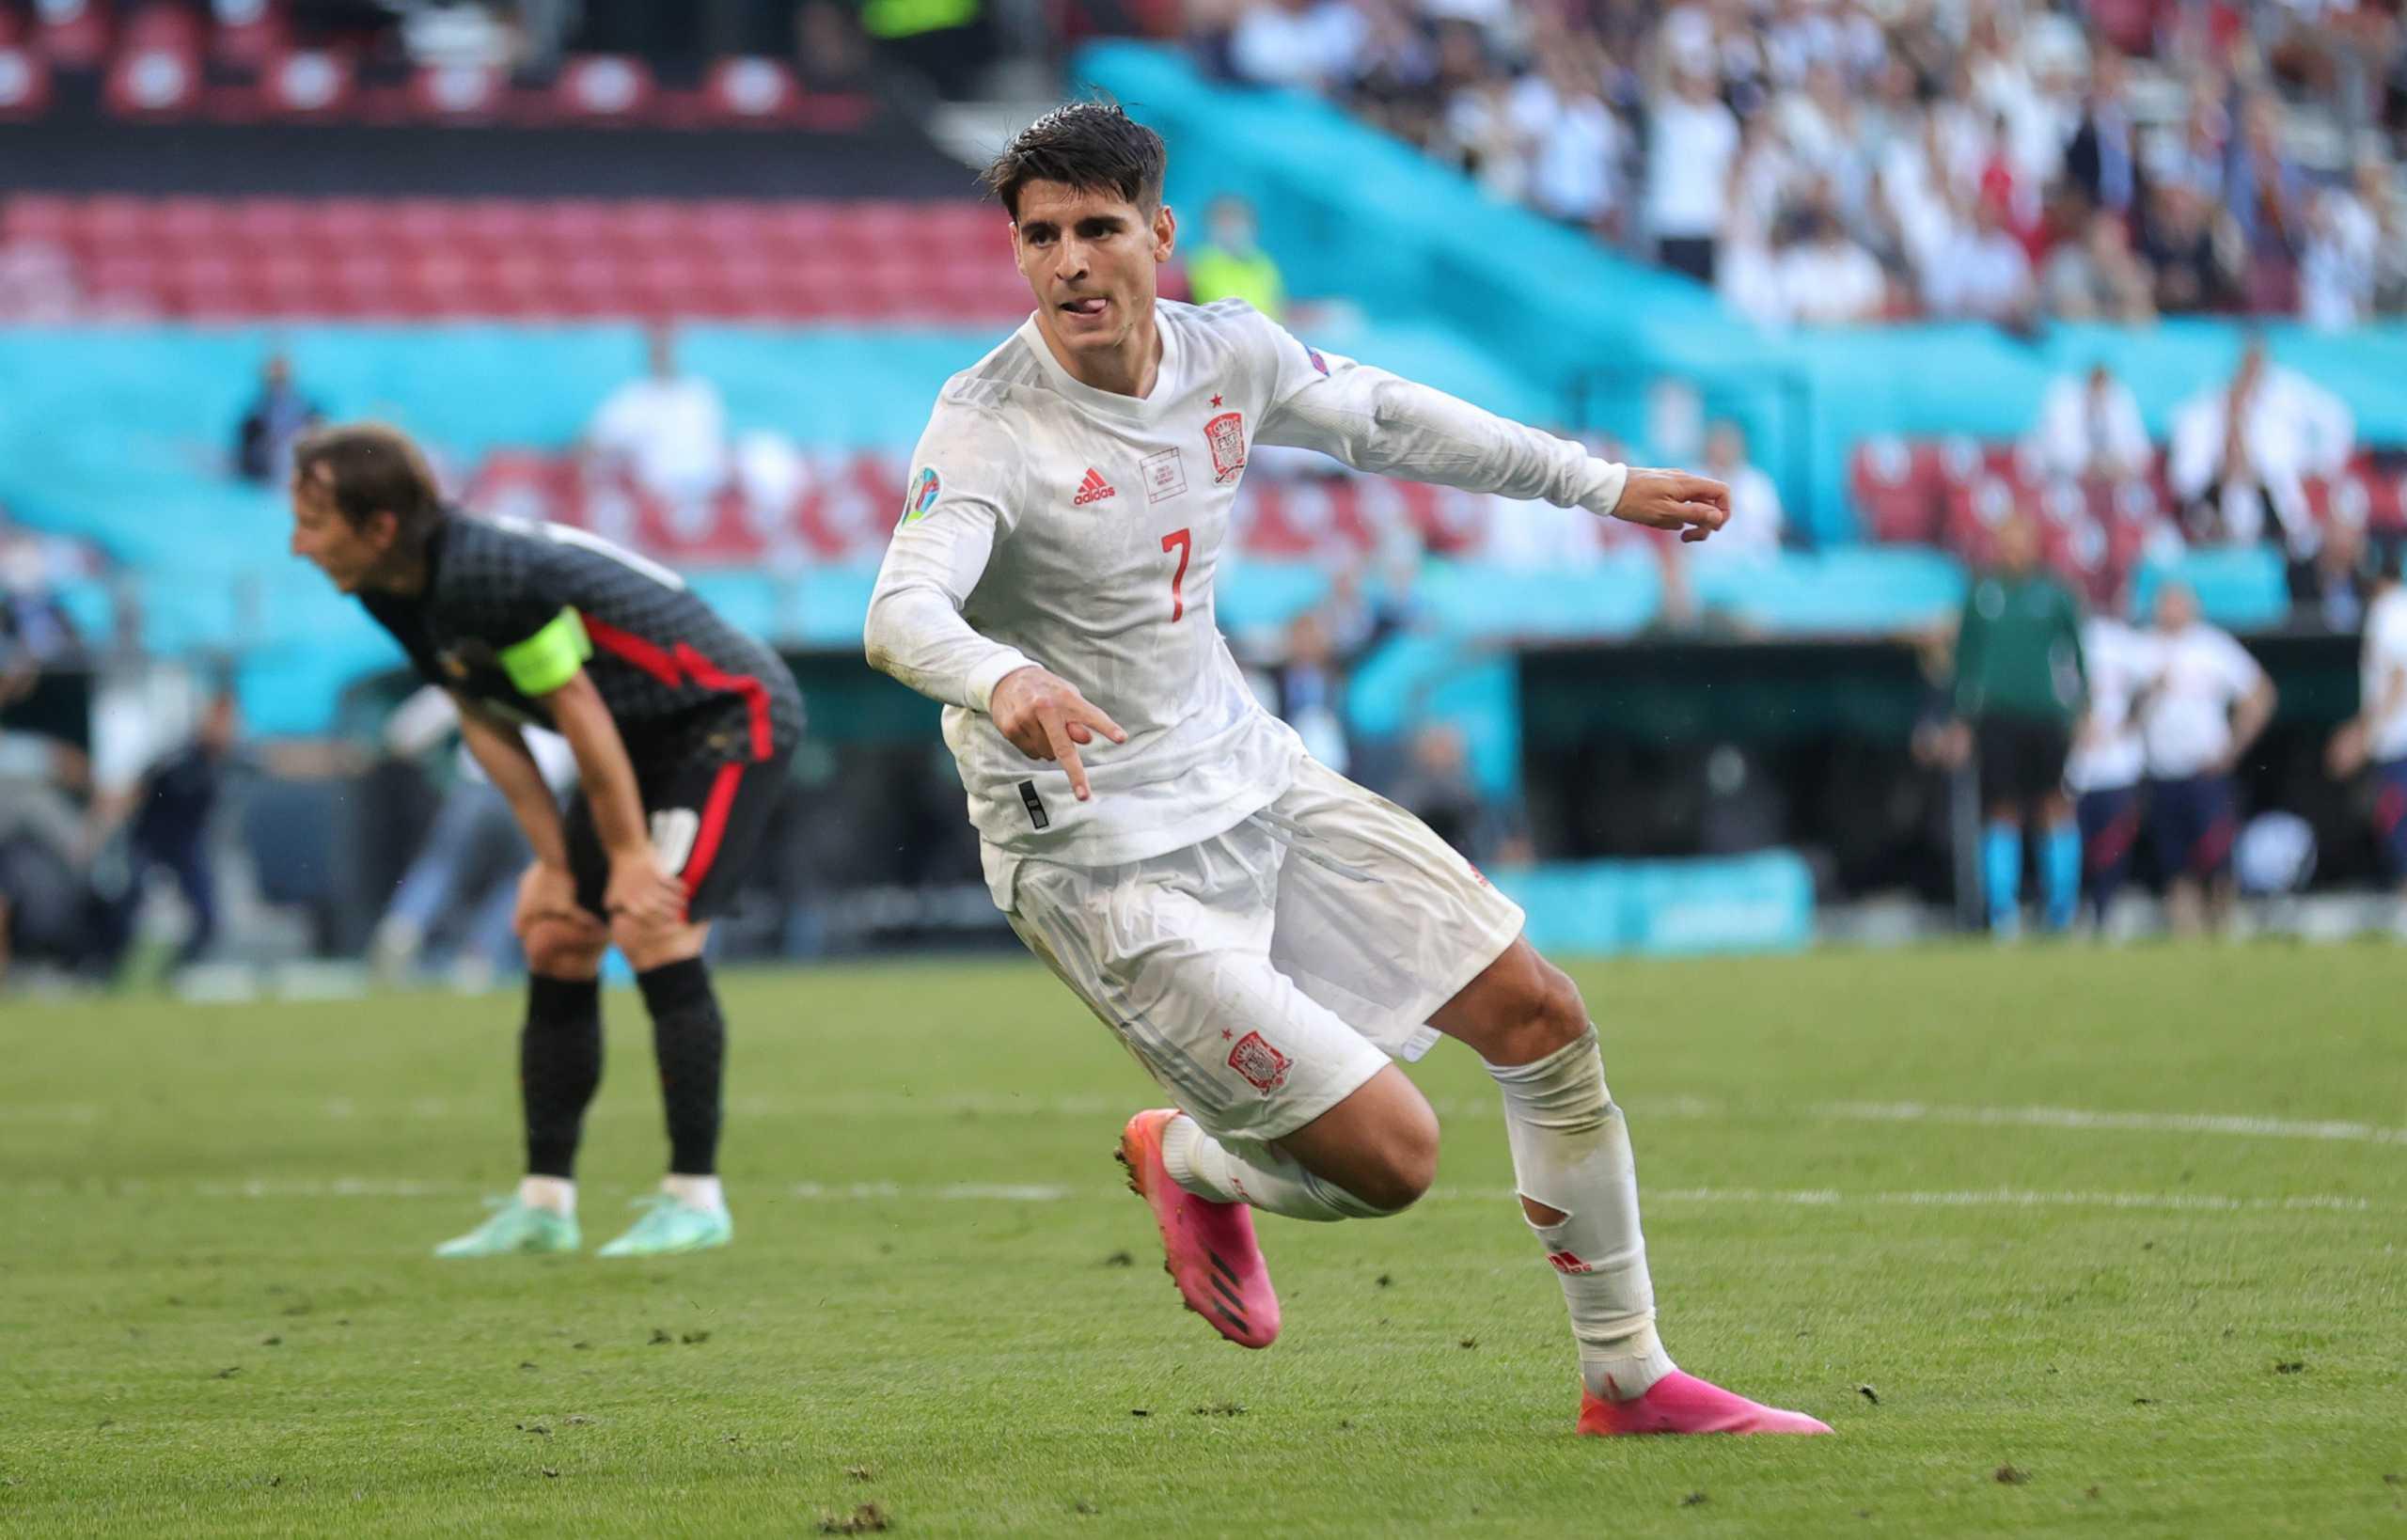 Euro 2020, Κροατία – Ισπανία: «Πάρτι» στην παράταση για τους Ίβηρες